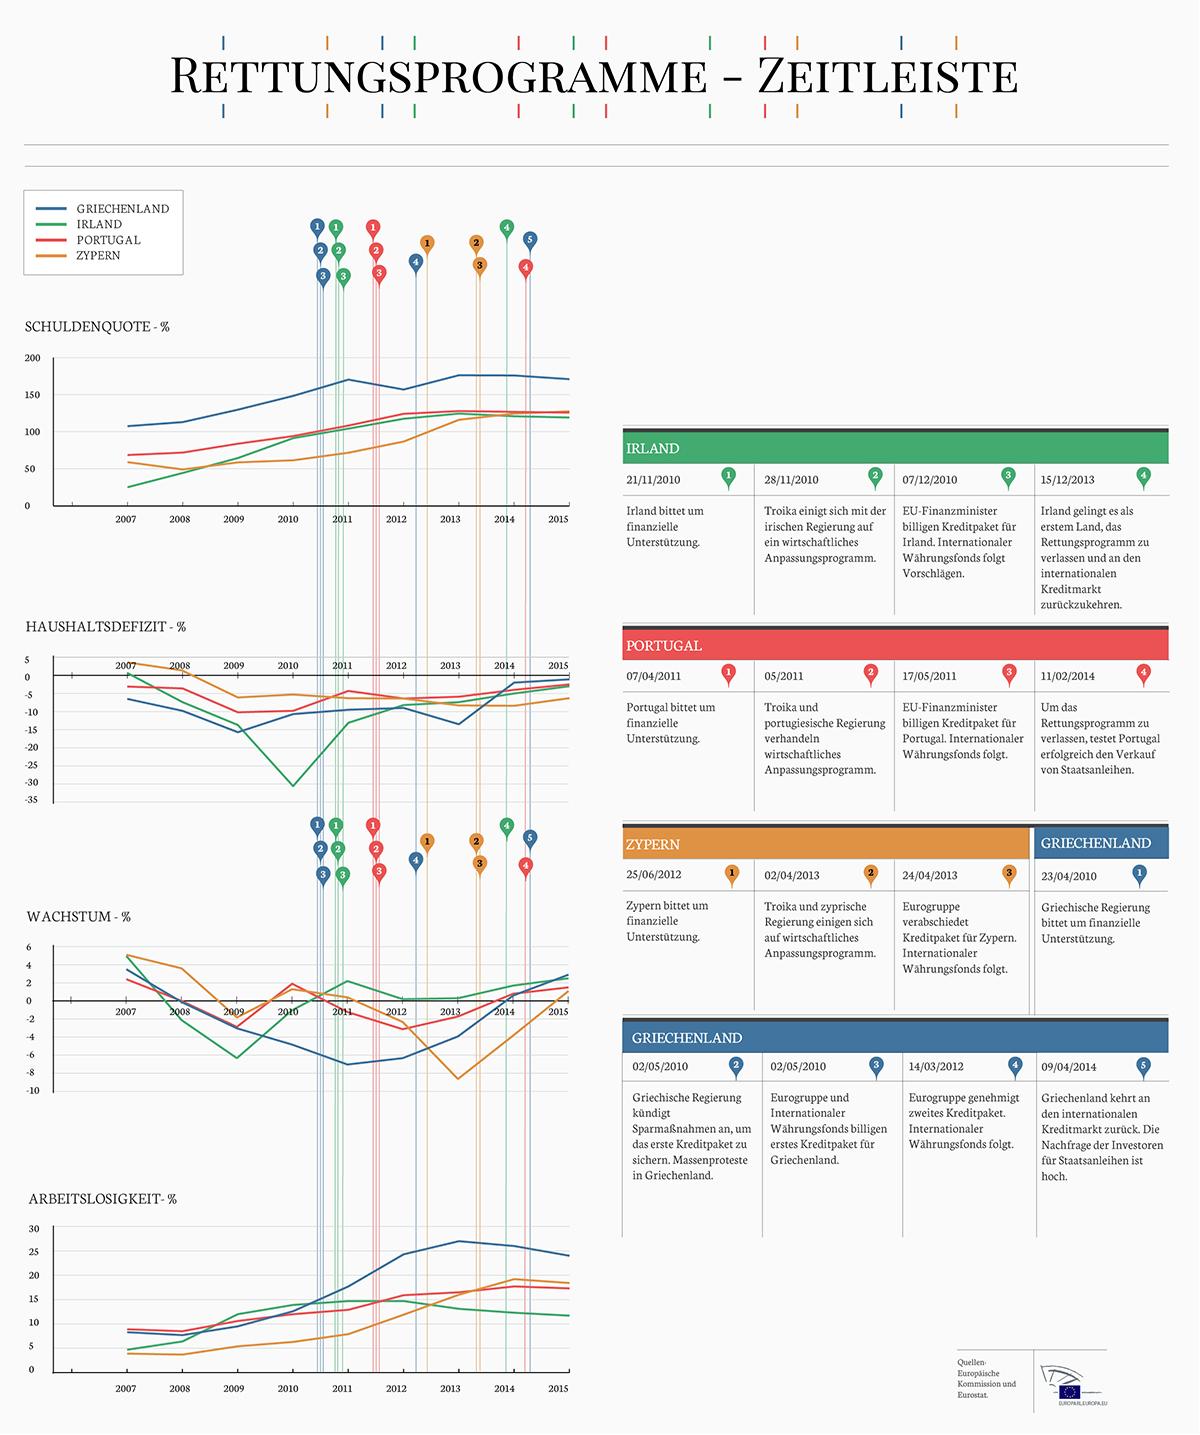 Troika-Infografik: Zeitleiste zu Rettungspaketen | Aktuelles ...